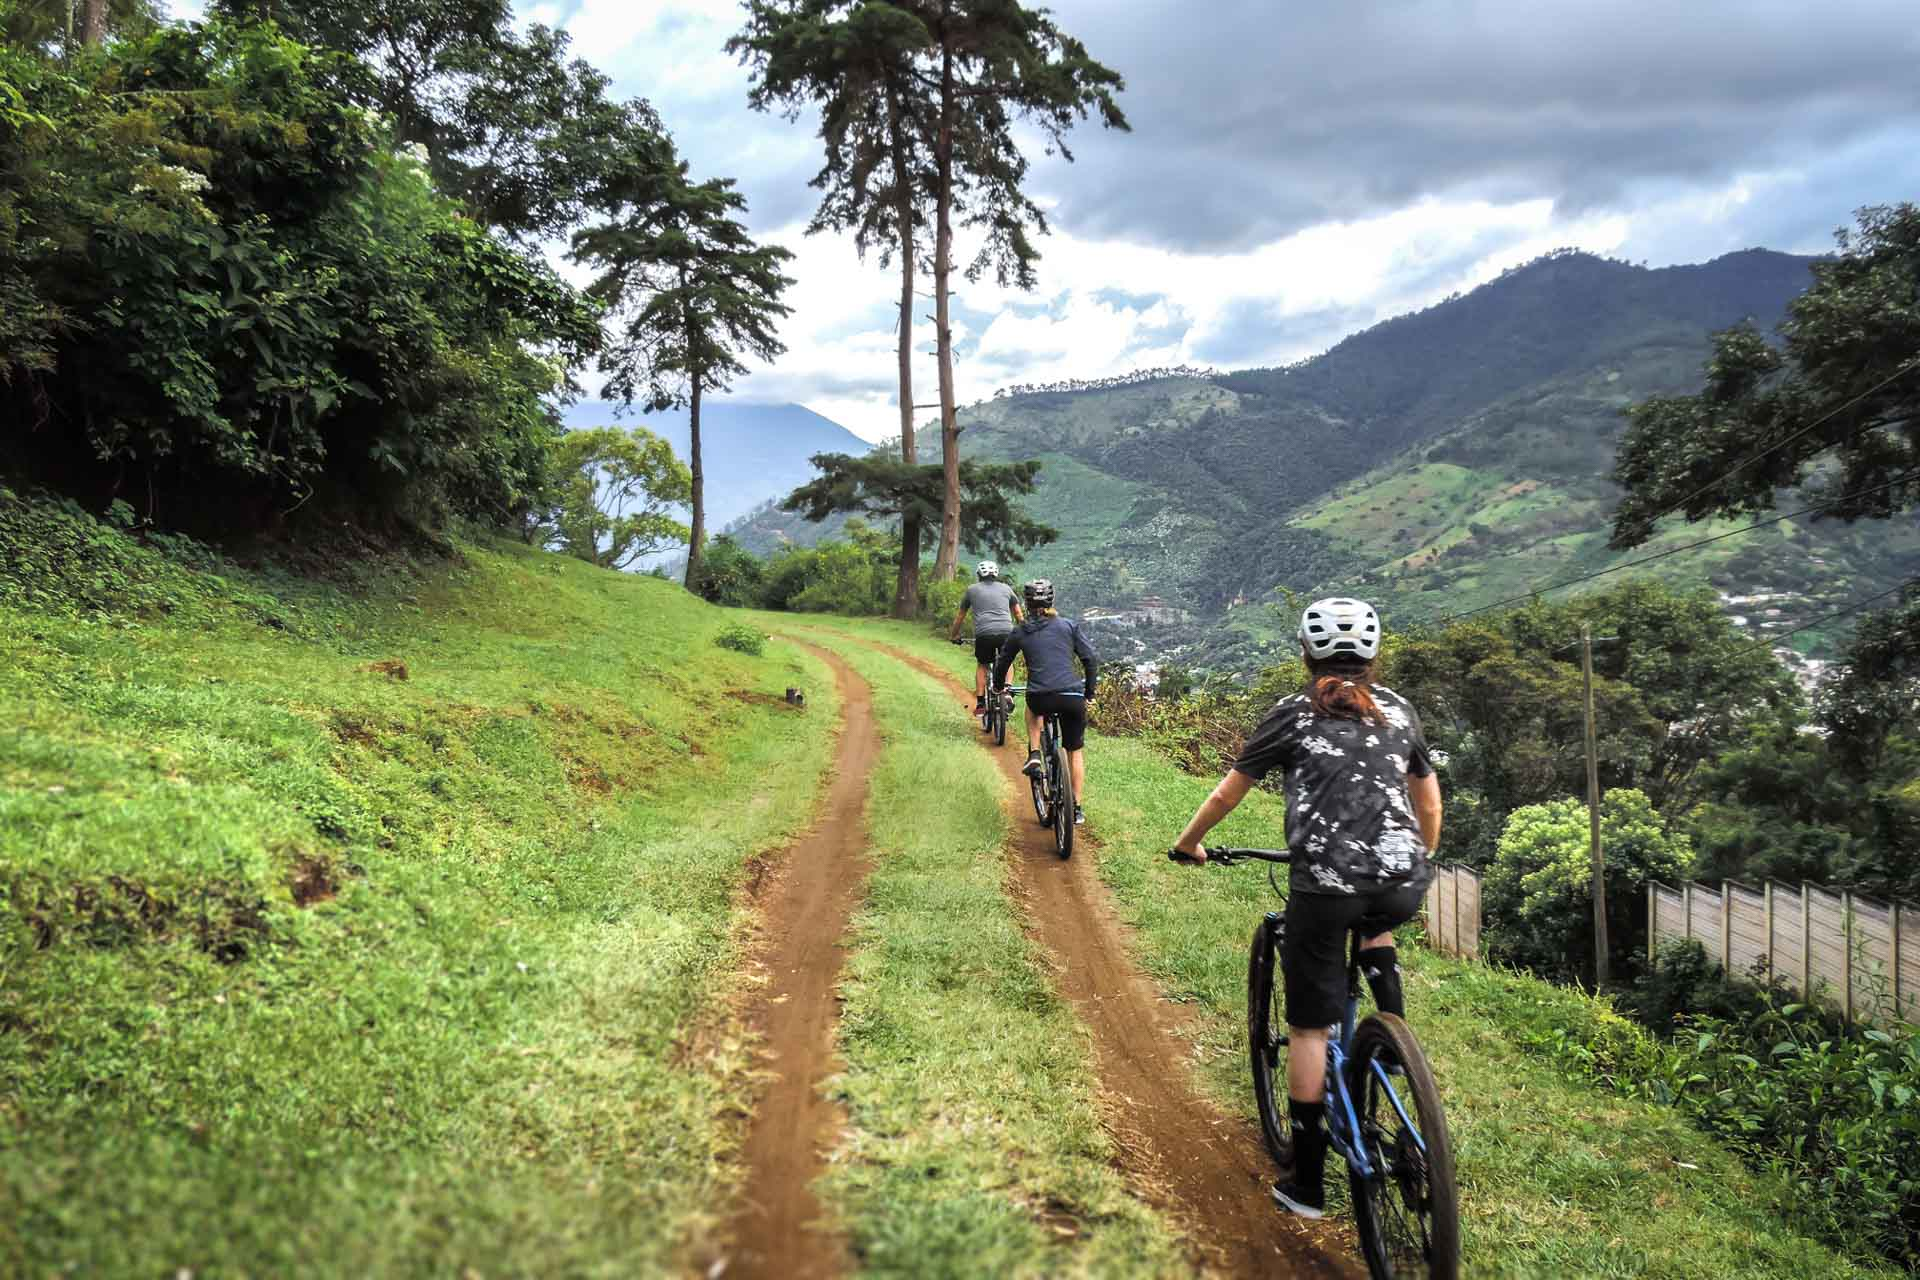 Mountain Biing to the festival De Barriletes Gigantes